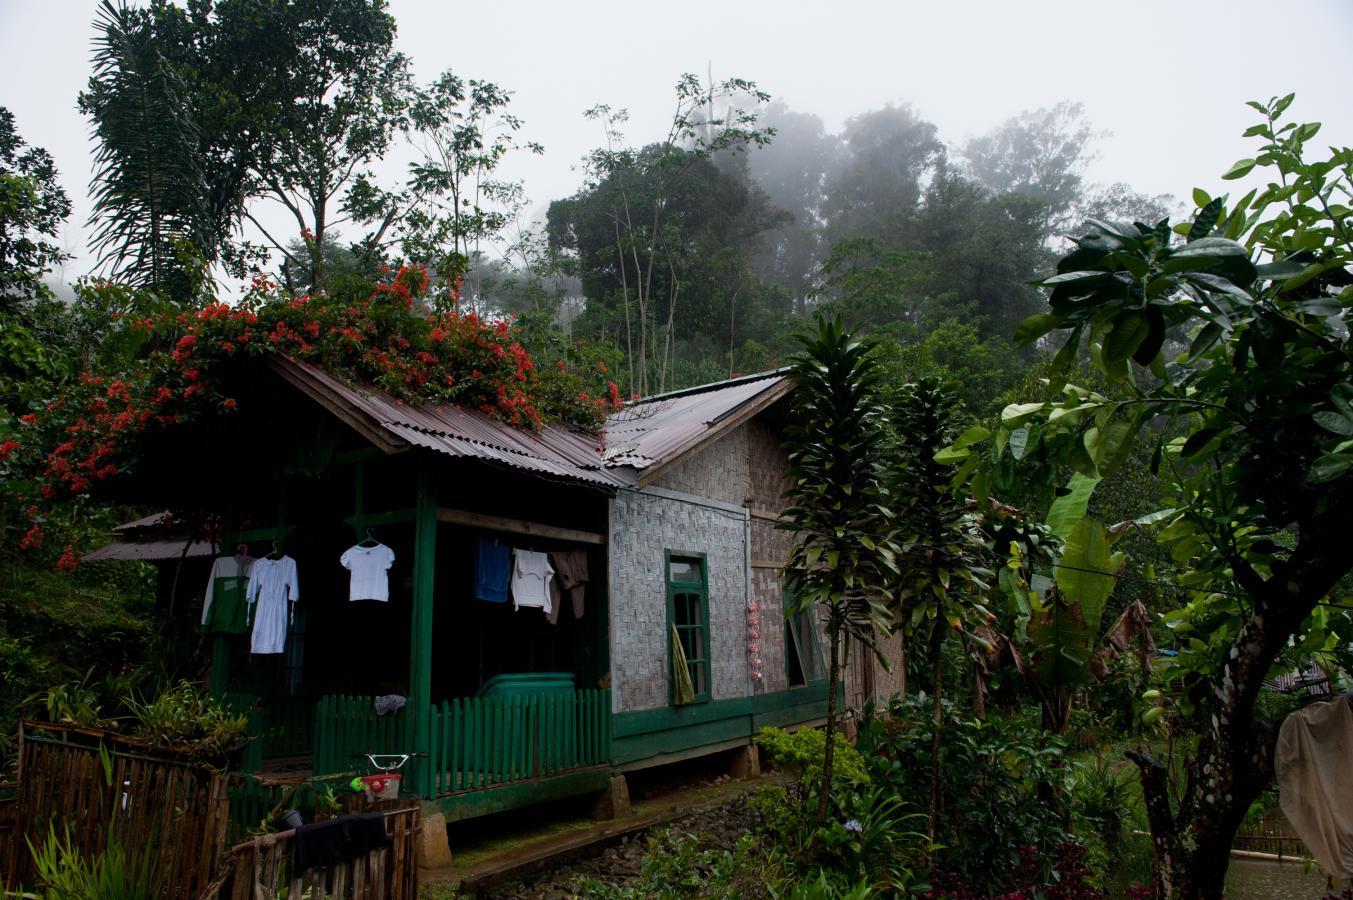 lost-in-the-jungle-1-java-indonesia-2010